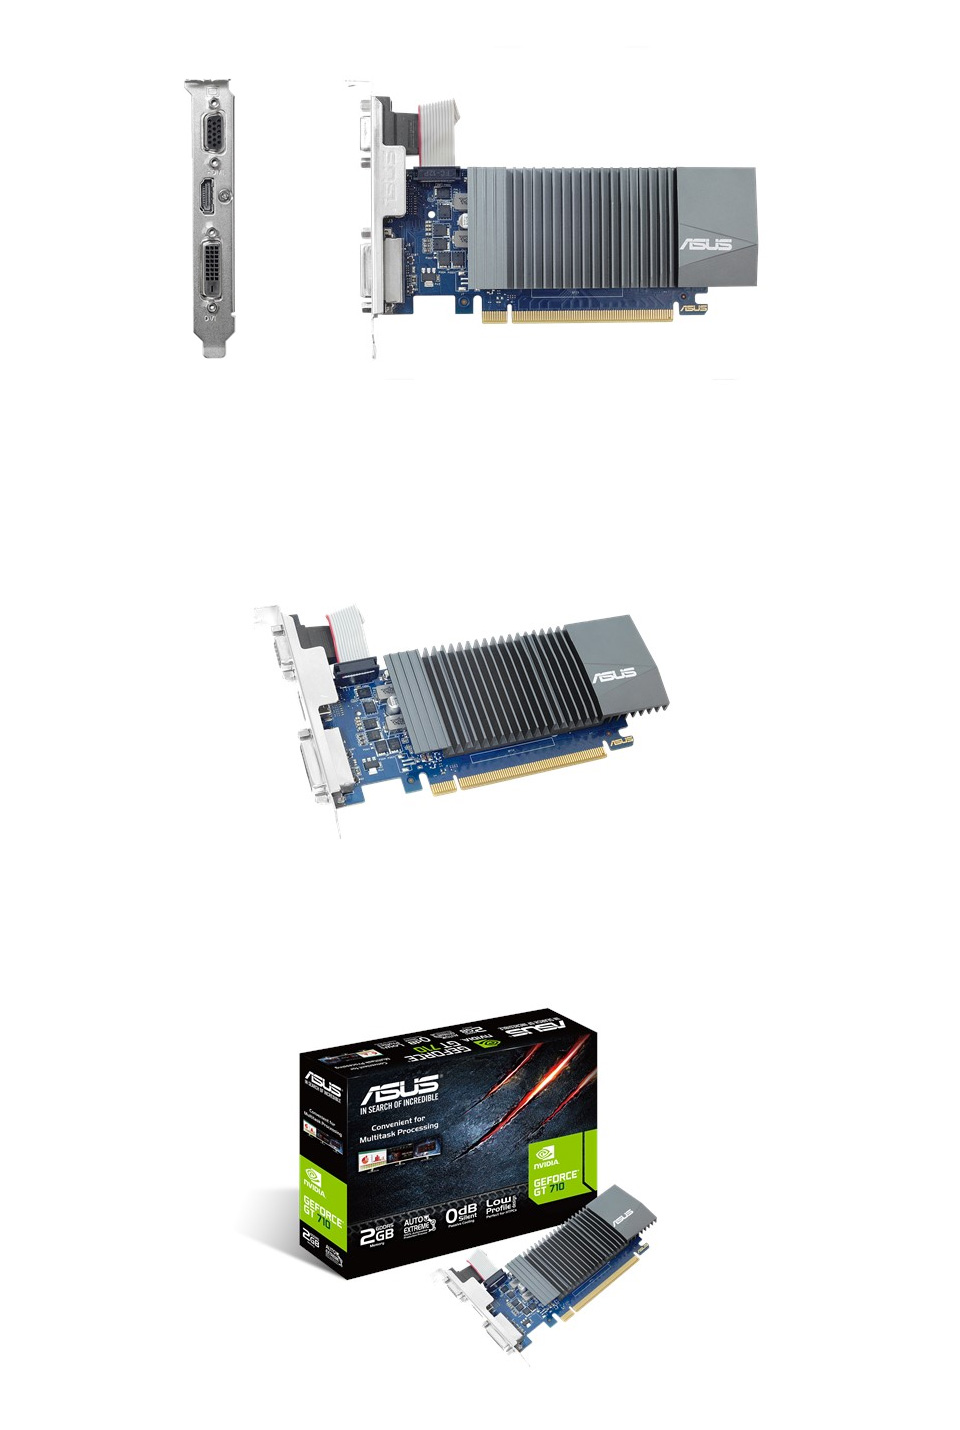 ASUS GeForce GT 710 2GB product